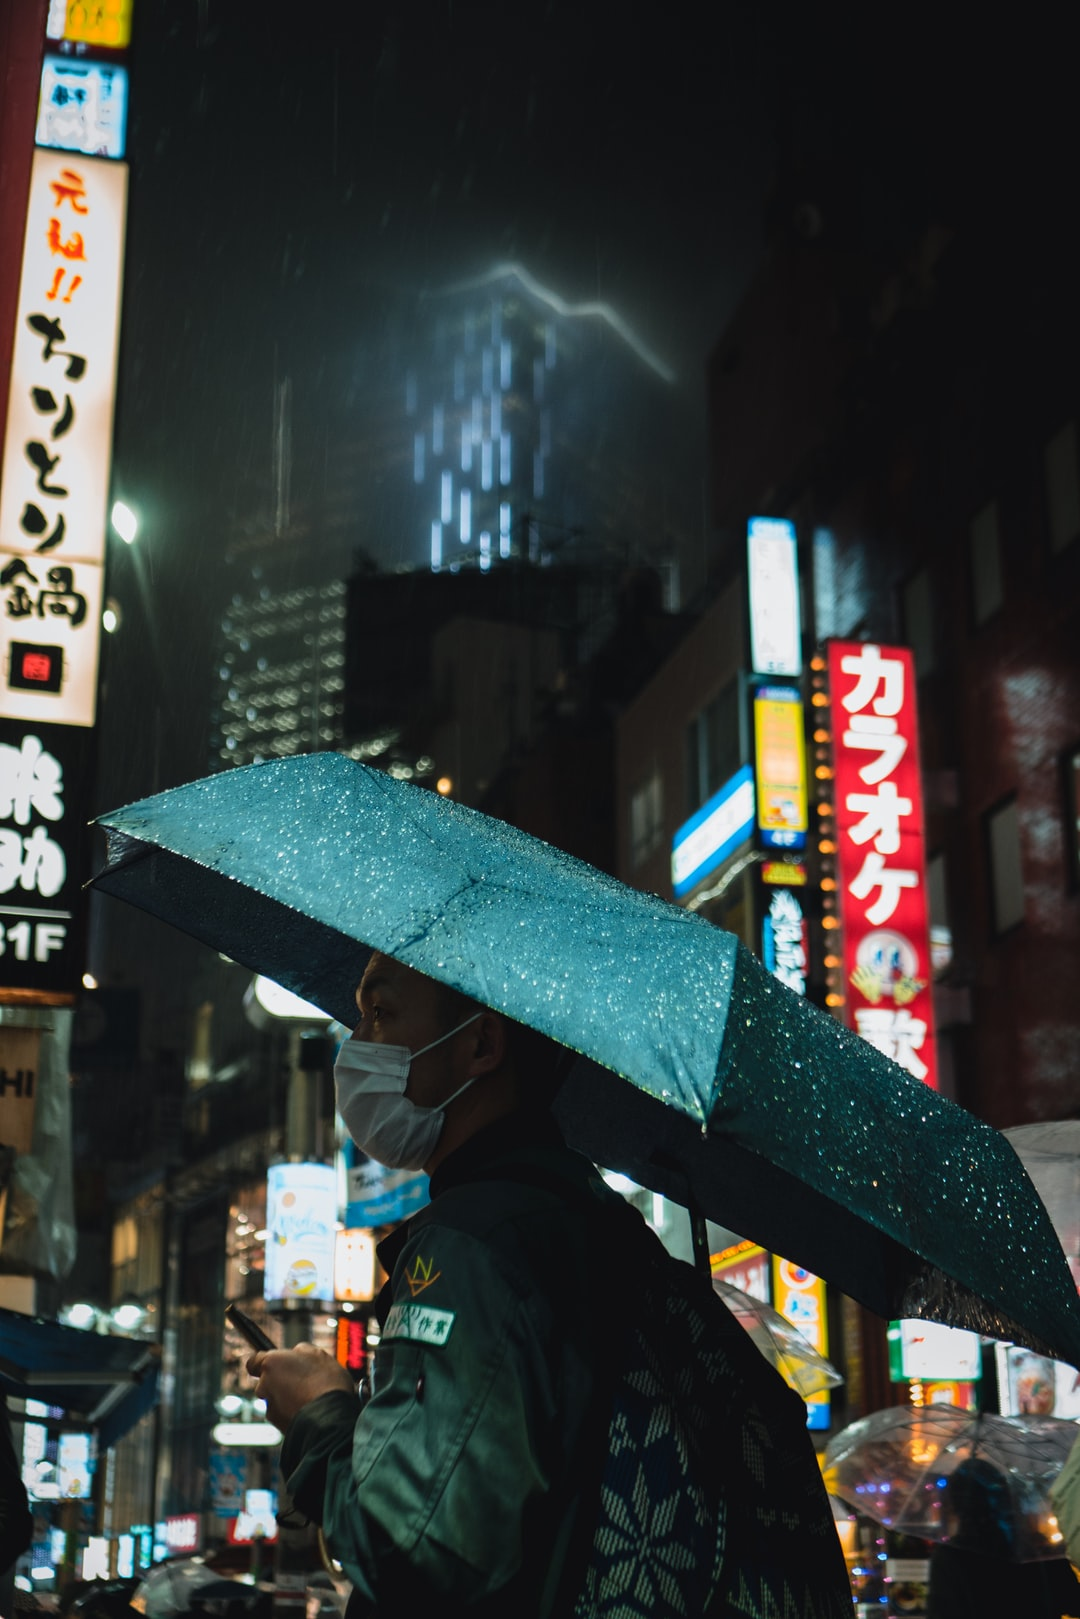 Man using an umbrella in Shibuya in the rain